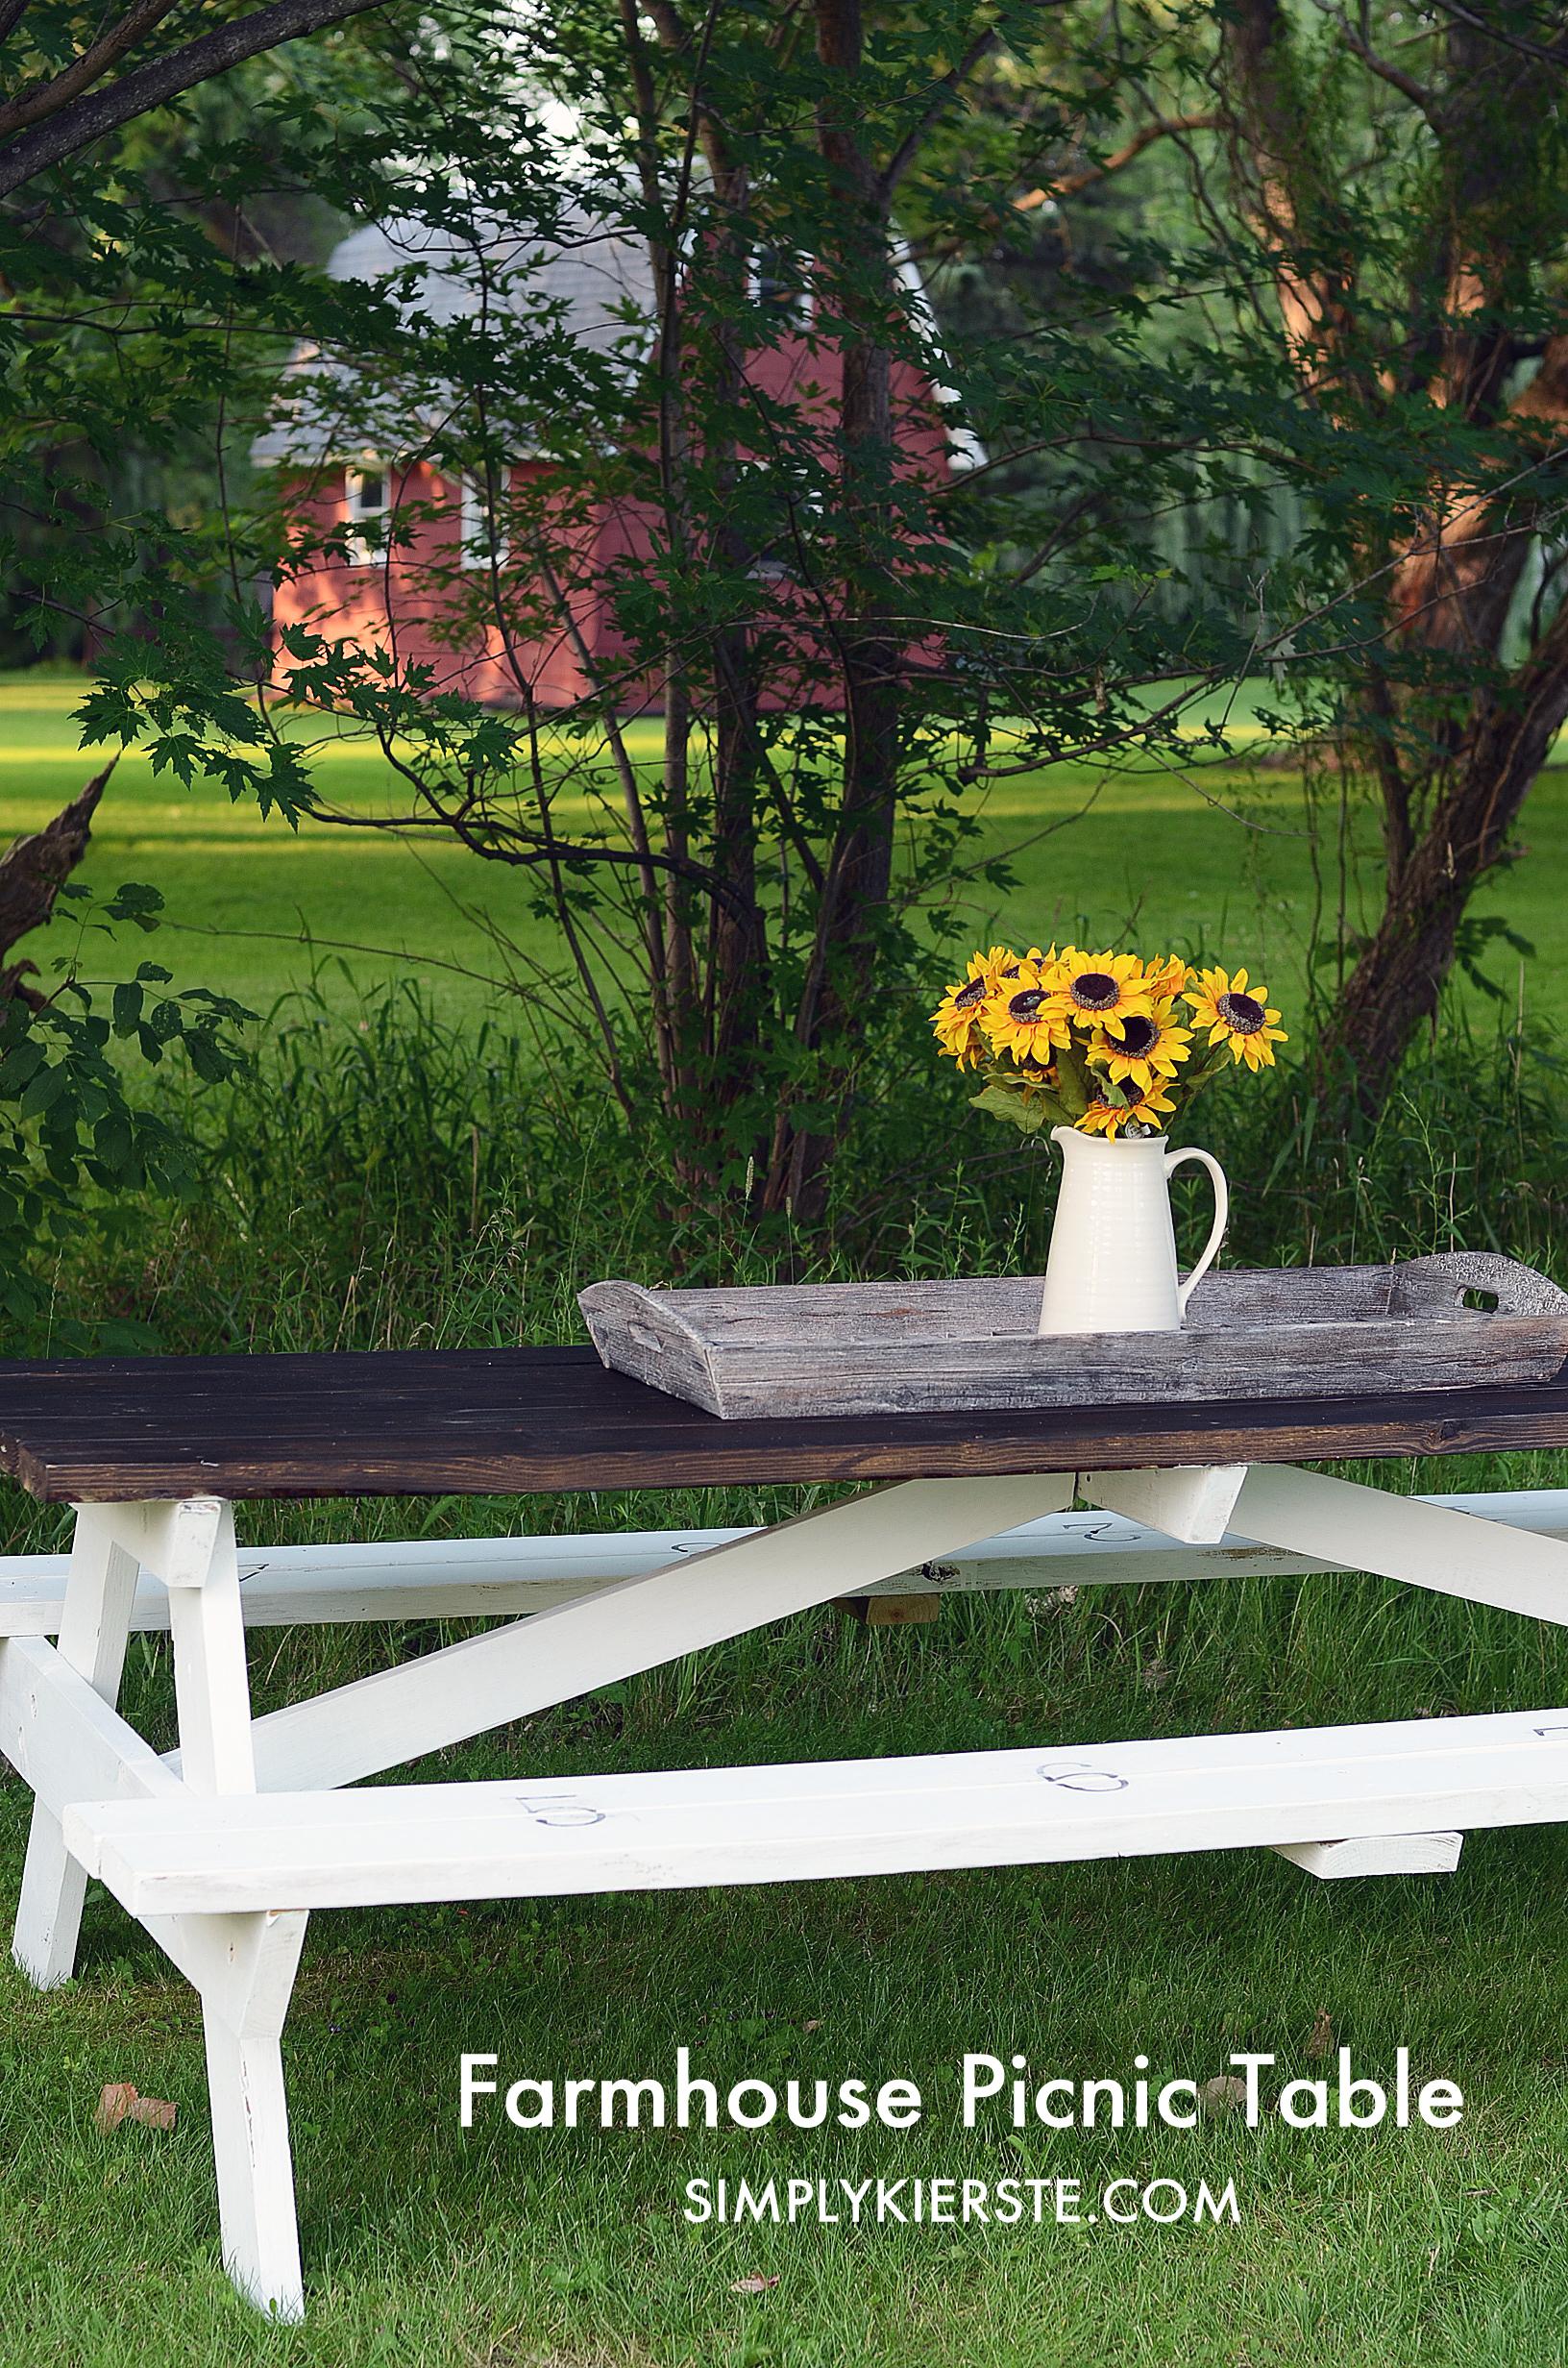 Farmhouse Style Picnic Table Simplykierste Com